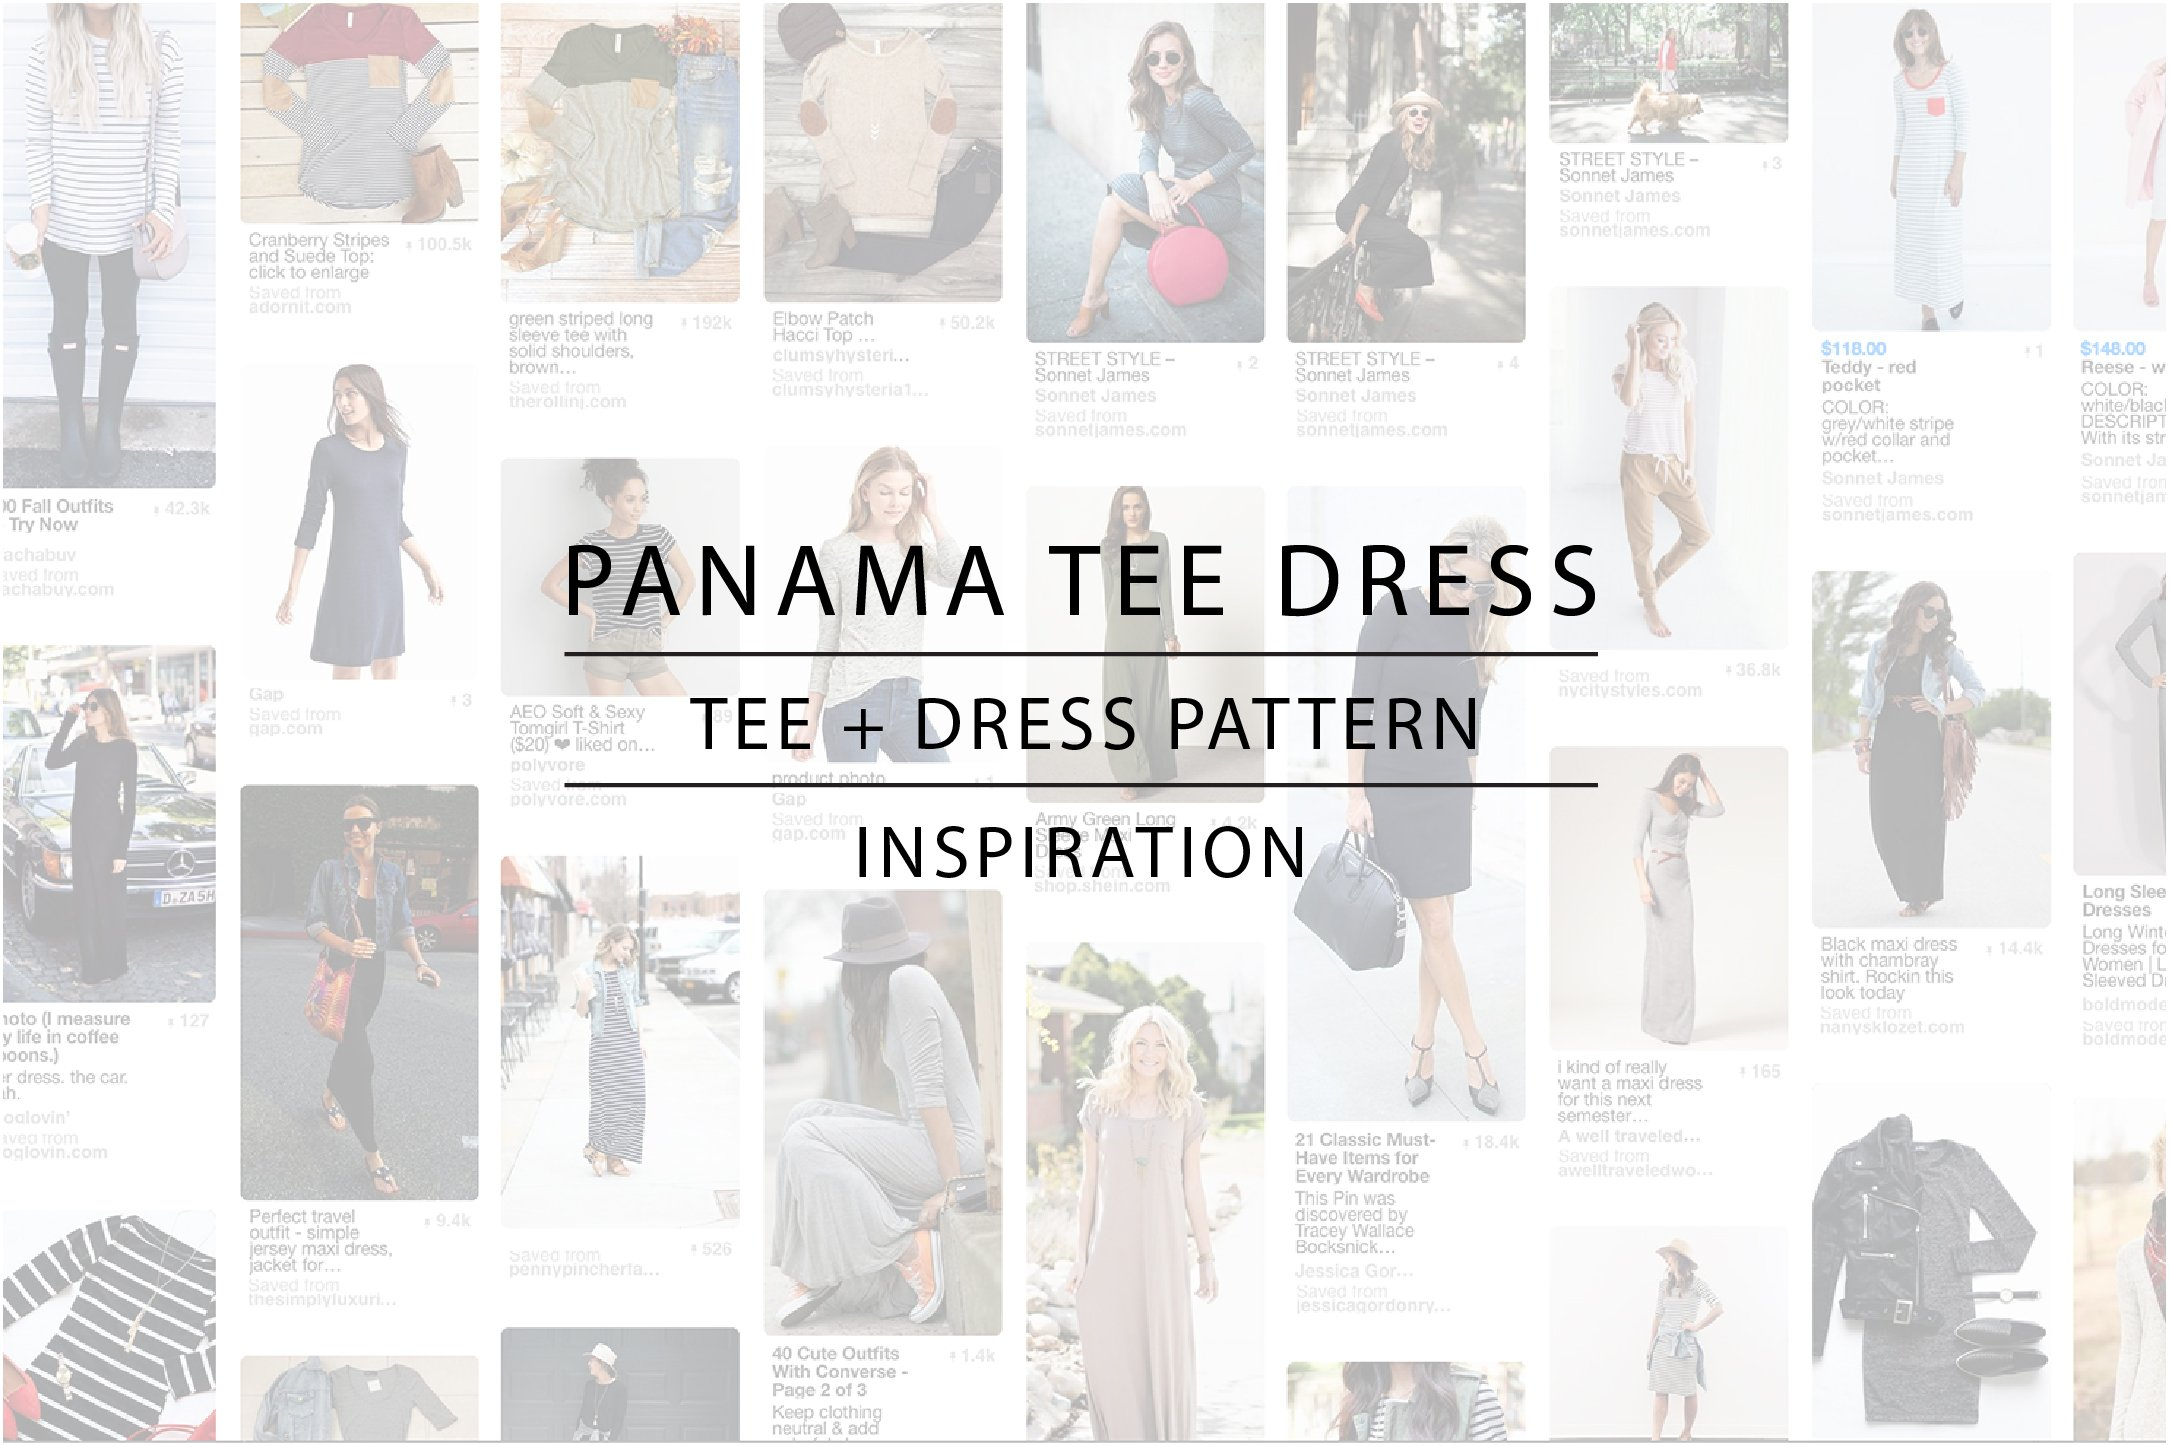 panama-inspiration-cover-01